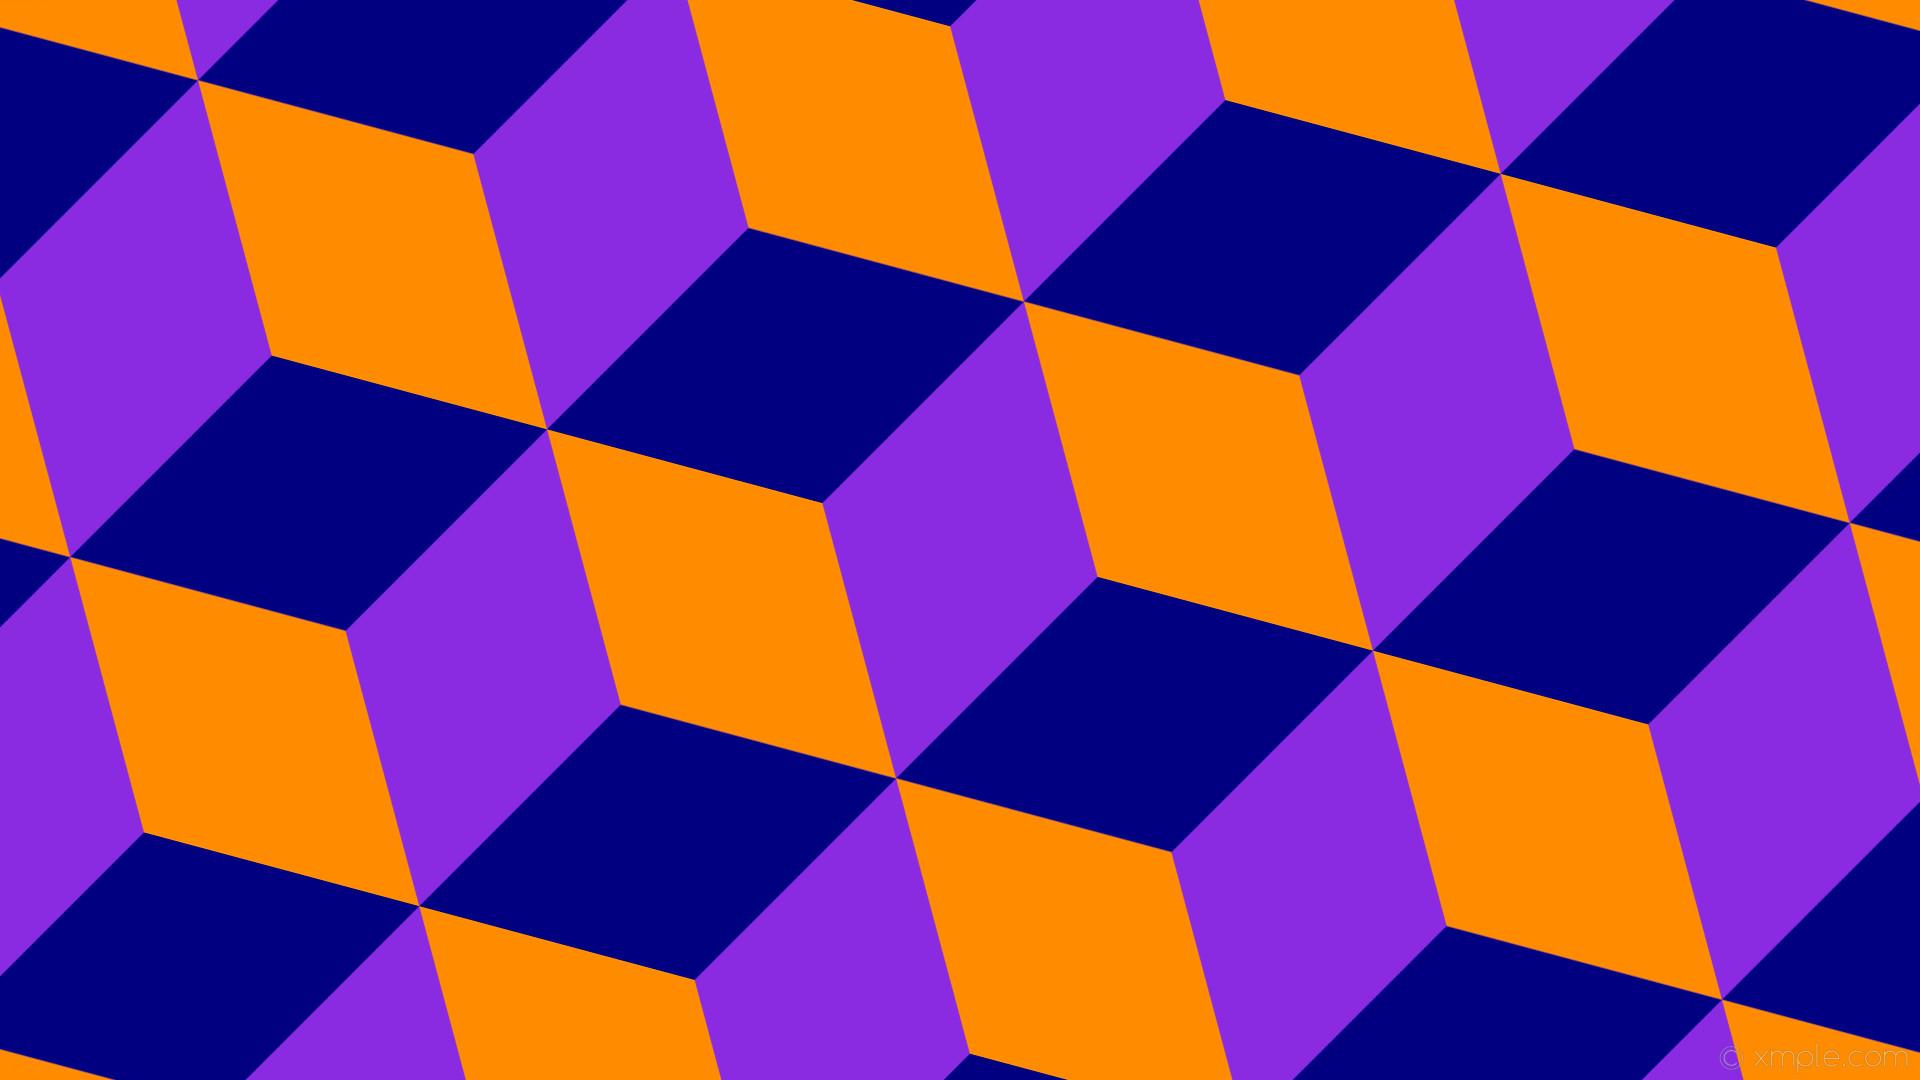 wallpaper purple 3d cubes orange blue blue violet navy dark orange #8a2be2  #000080 #